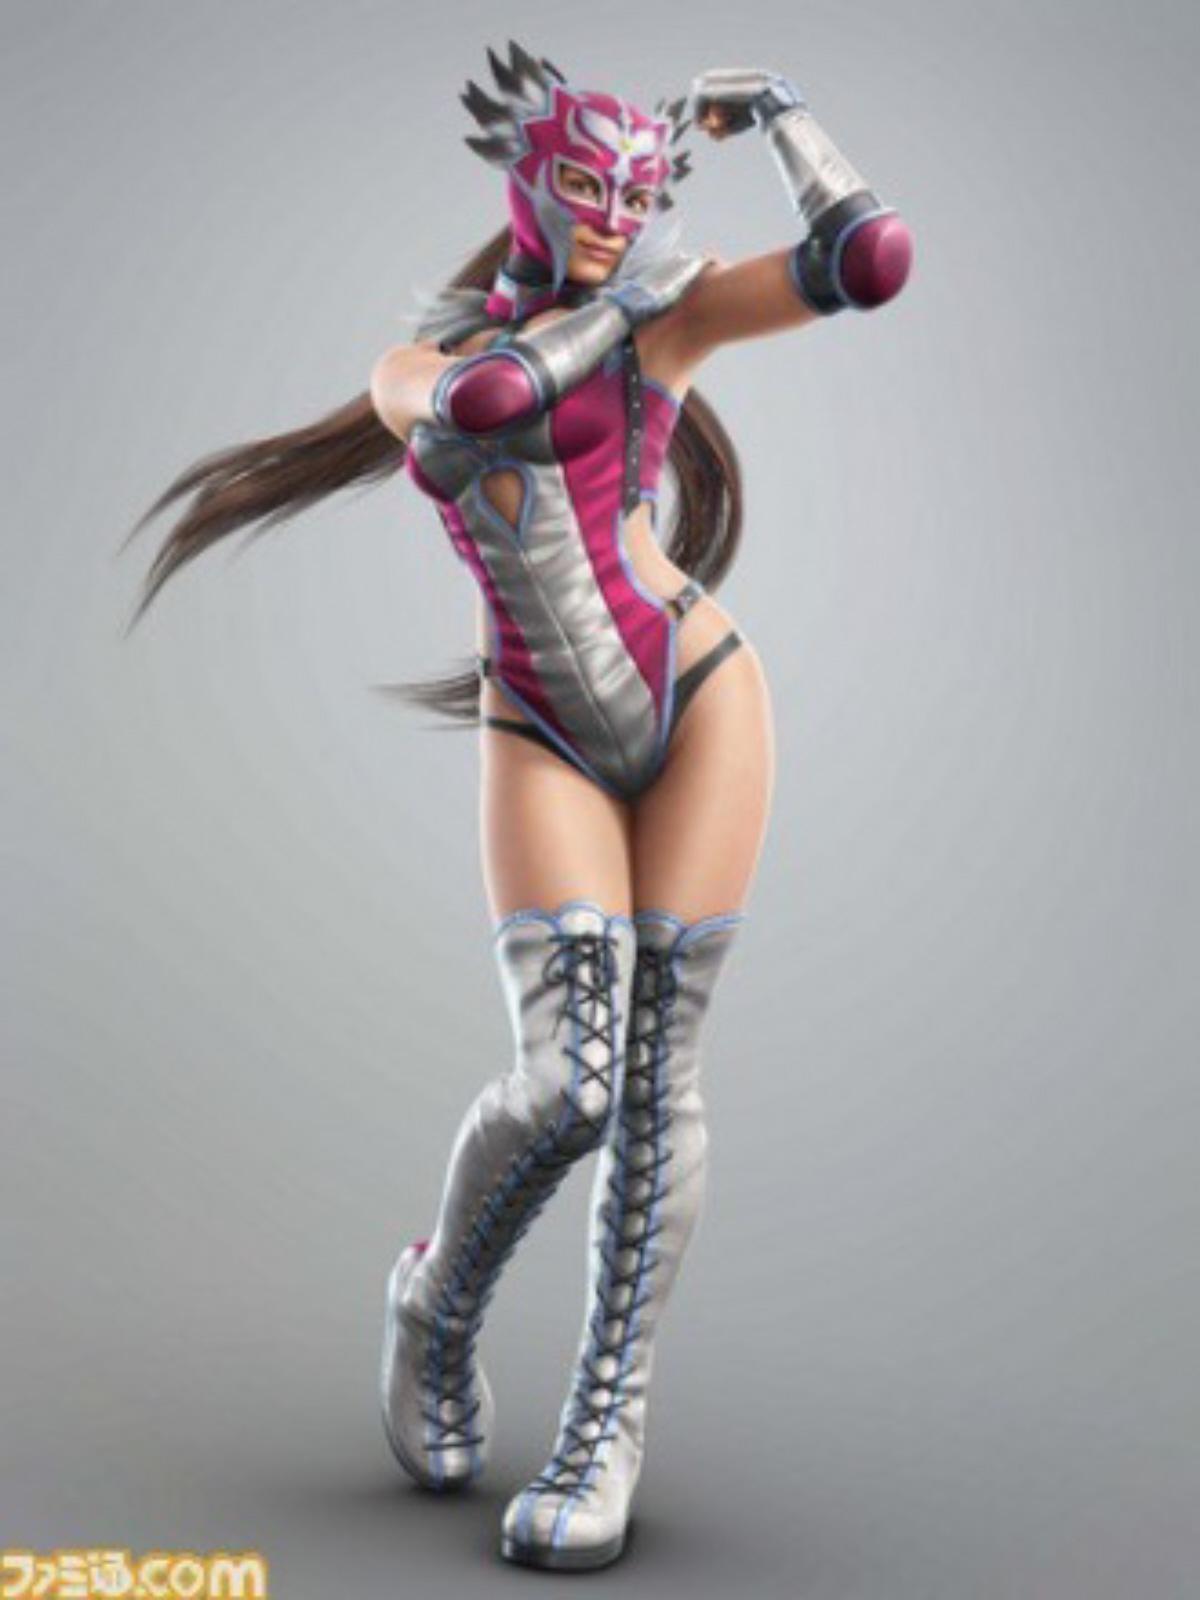 Tekken Tag Tournament 2 Sexy Jaycee Julia Chang In Luchadora Disguise Character Artwork